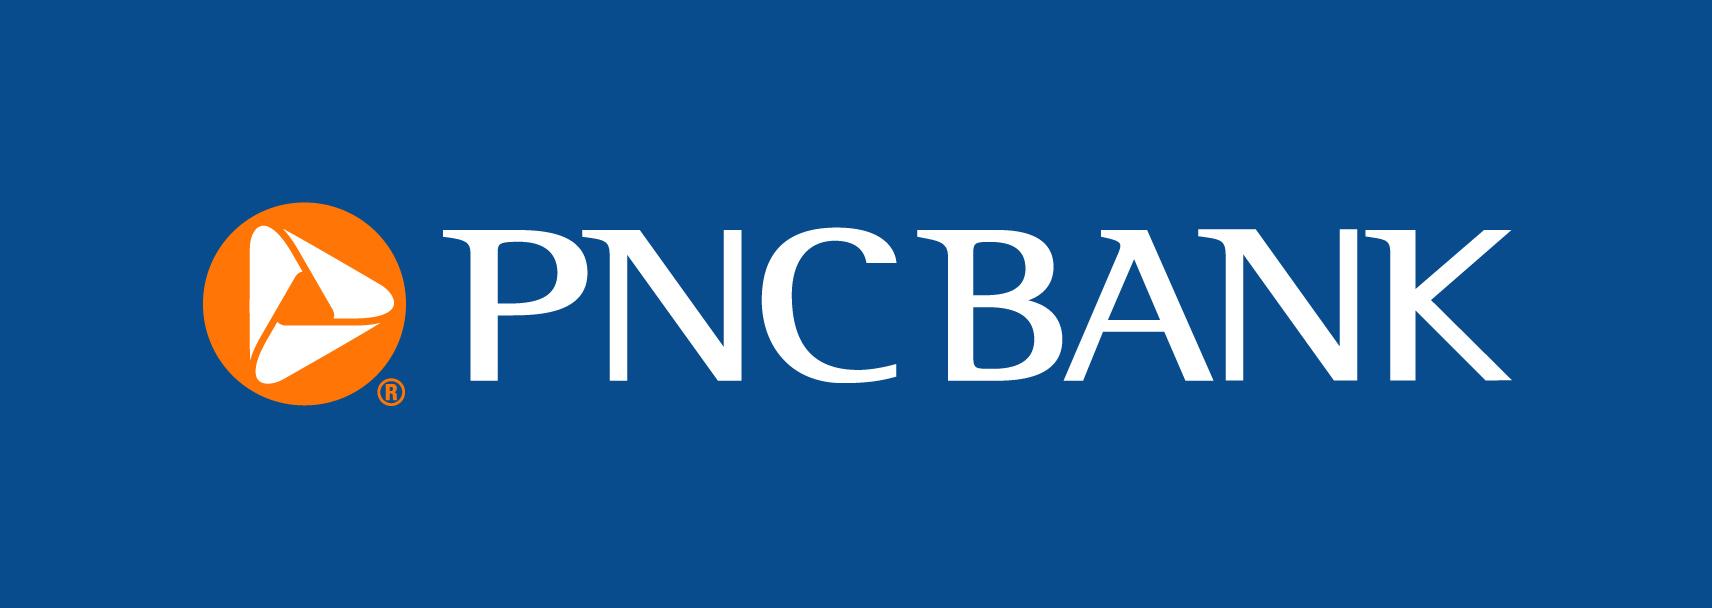 PNCBank_Rc2_RGB